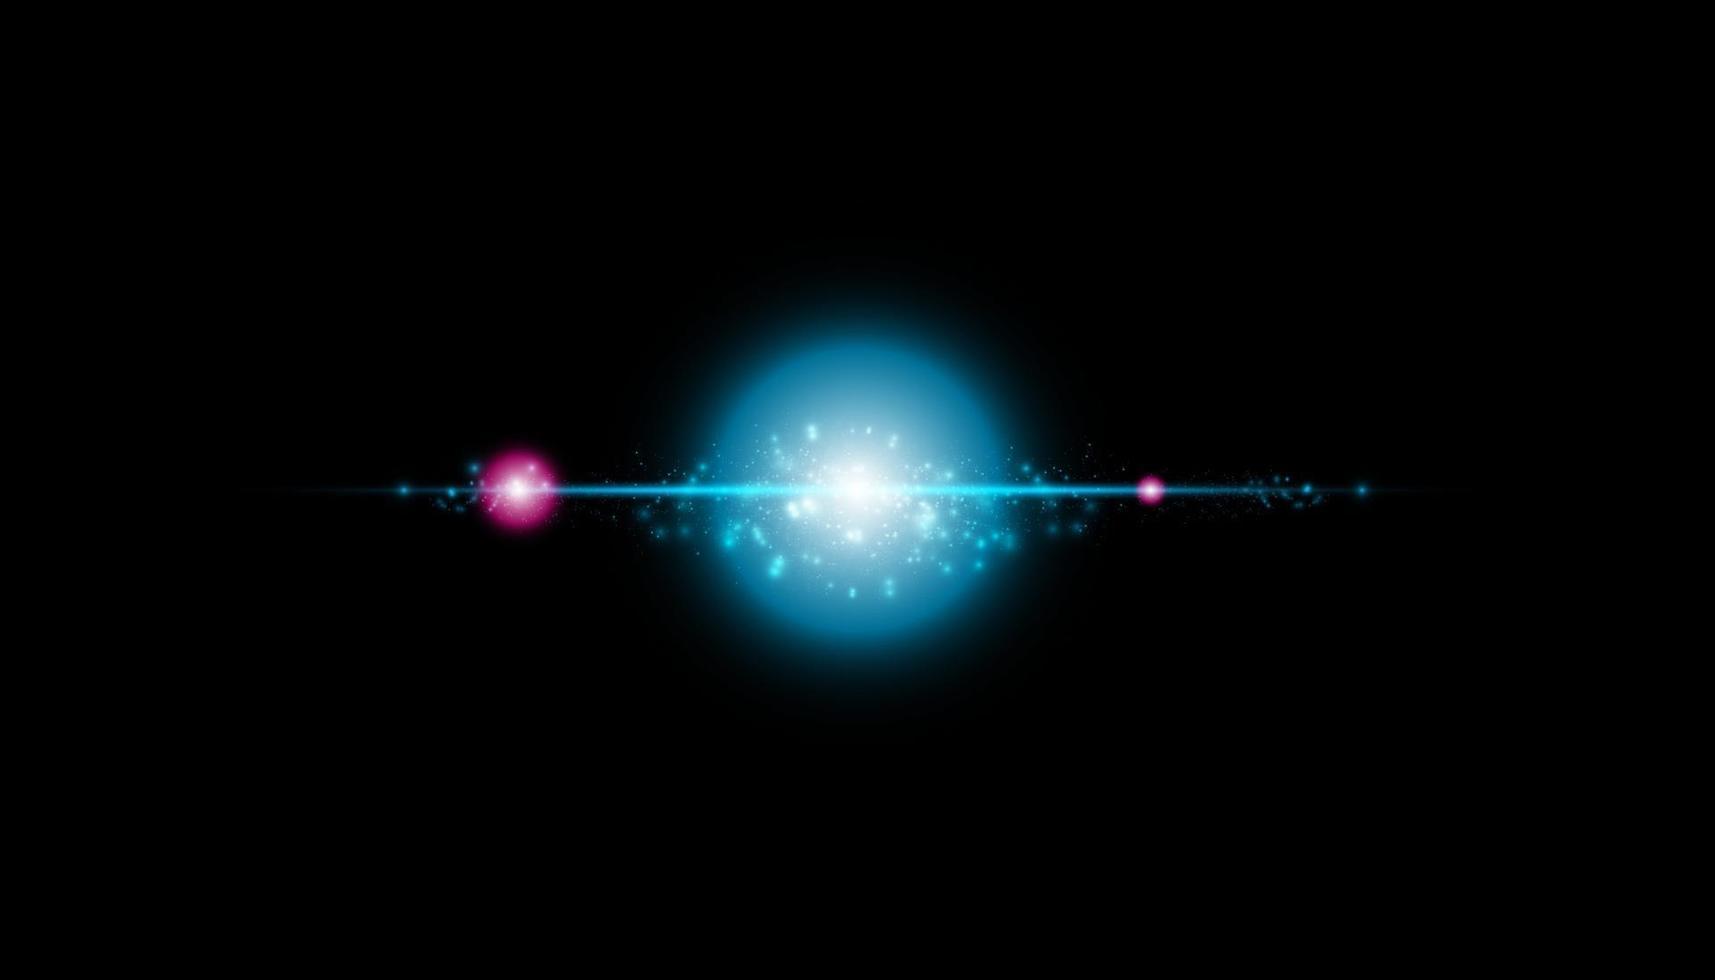 resplandor aislado efecto transparente azul, destello de lente, explosión, brillo, vector